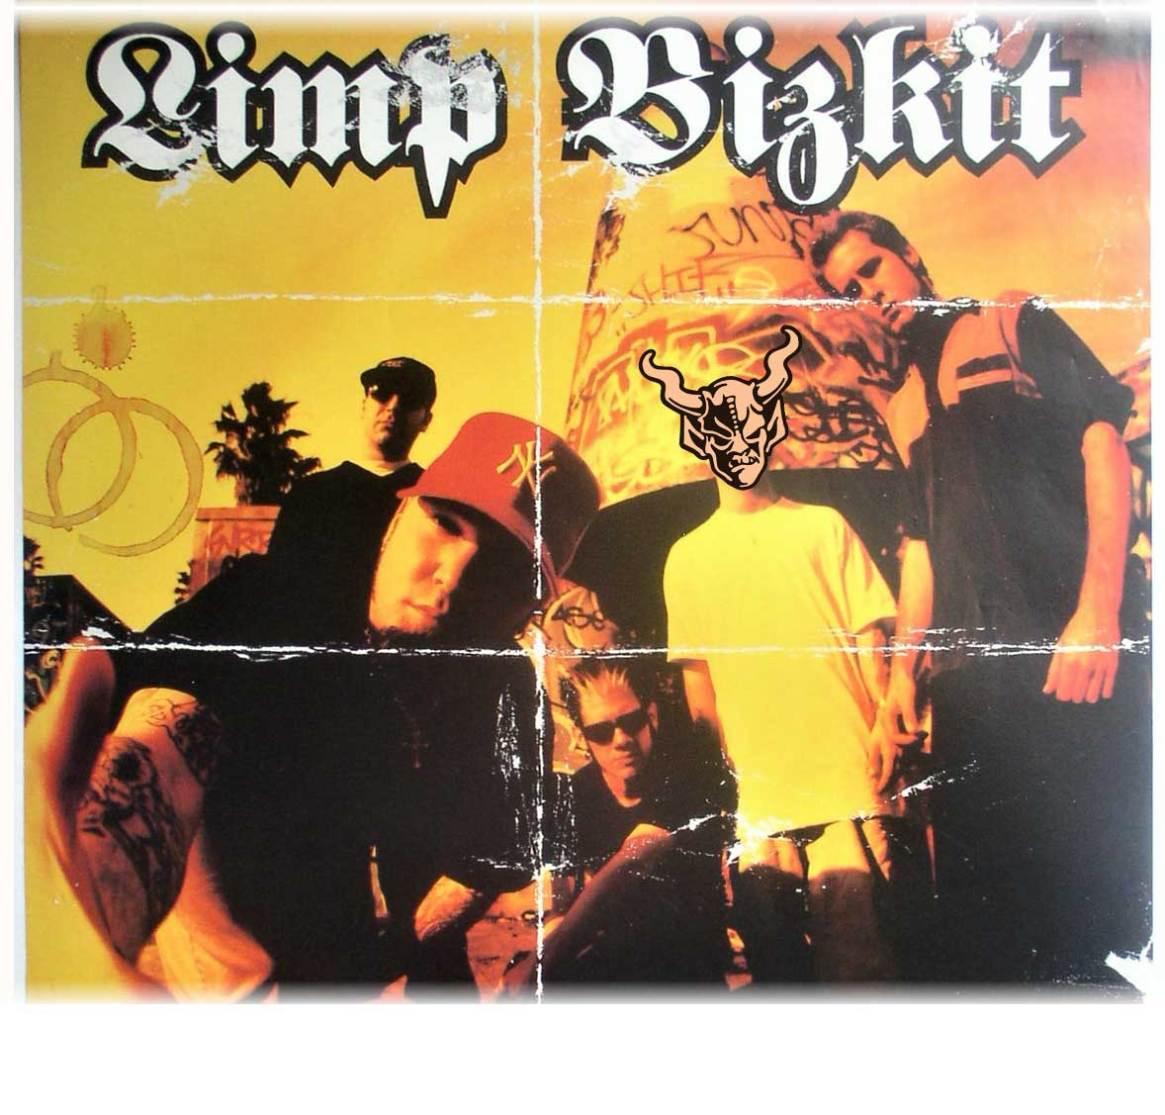 Limp Bizkit and Stone